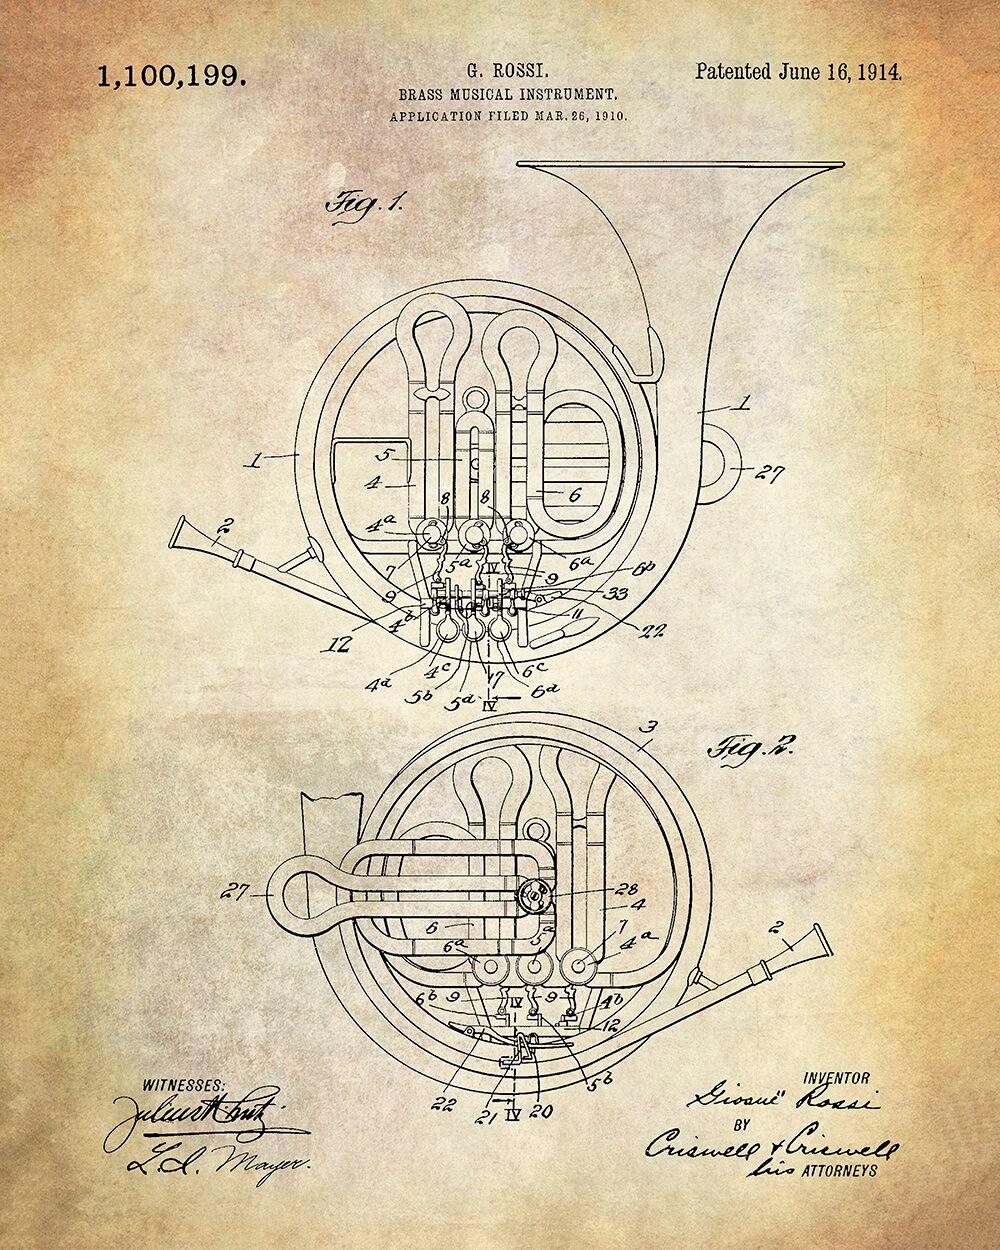 medium resolution of brass musical instrument patent art print french horn patent art print rossi brass musical instrument patent art print music patent